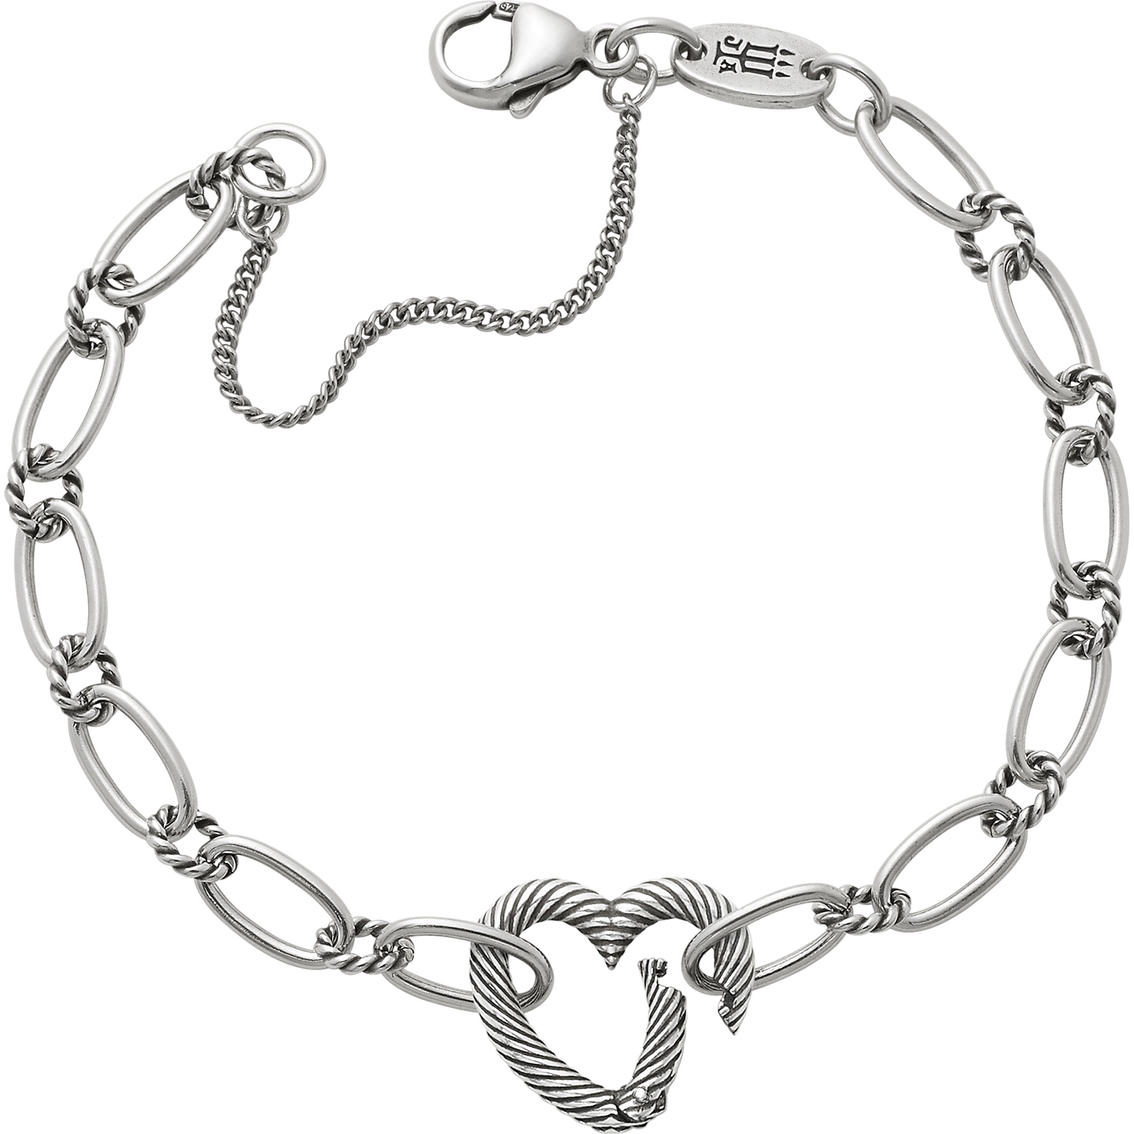 James Avery Changeable Heart Charm Bracelet   Silver Bracelets ...